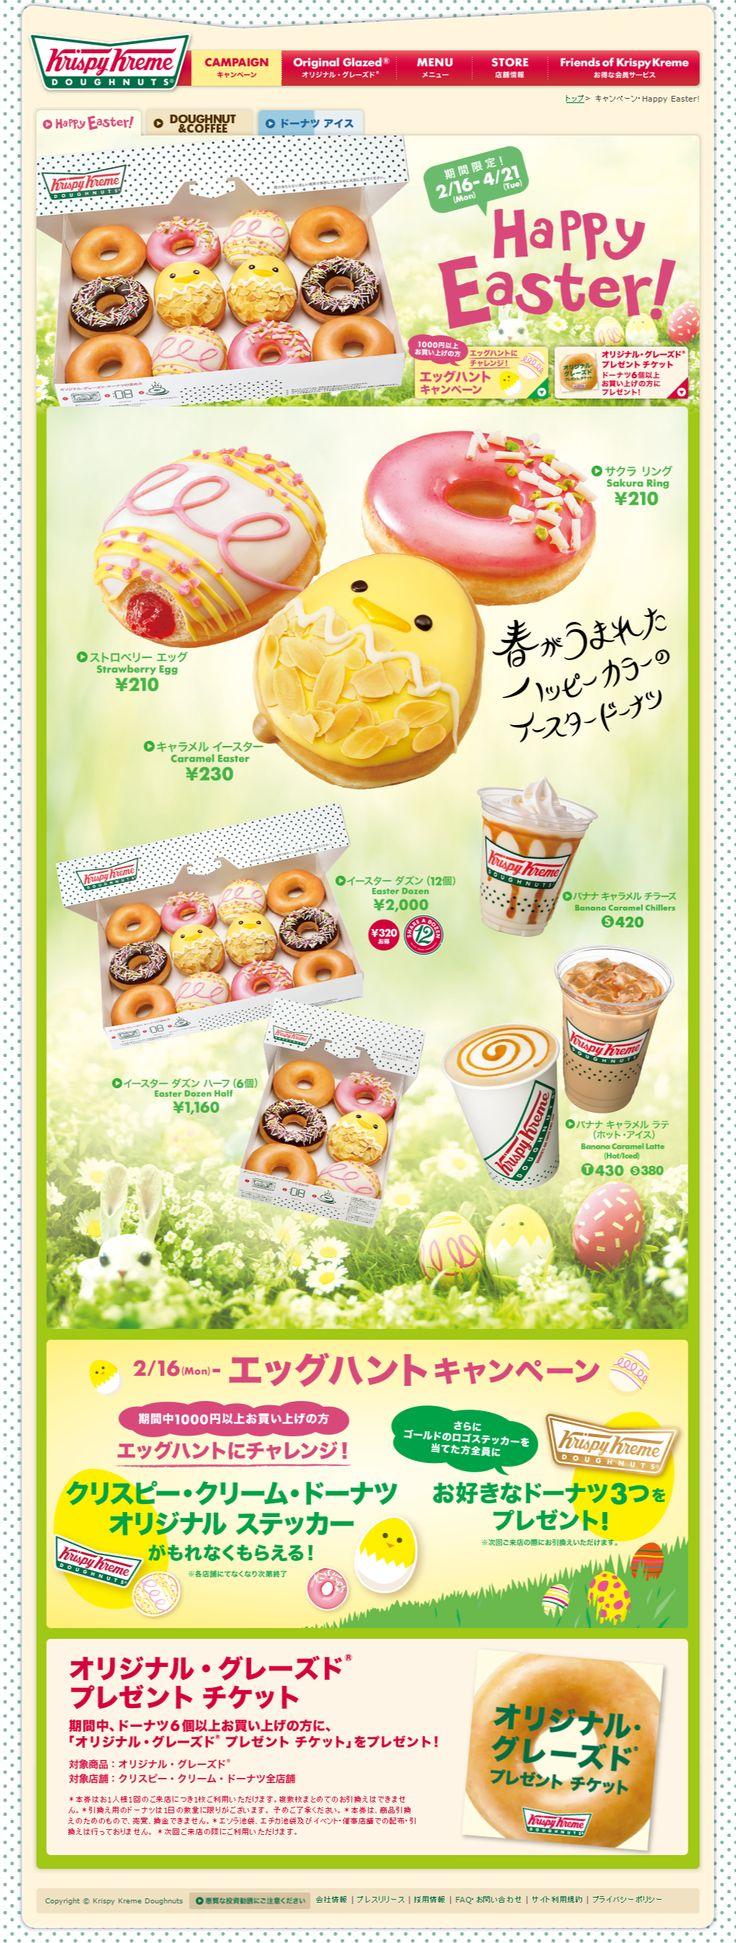 Krispy Kreme Doughnuts | キャンペーン